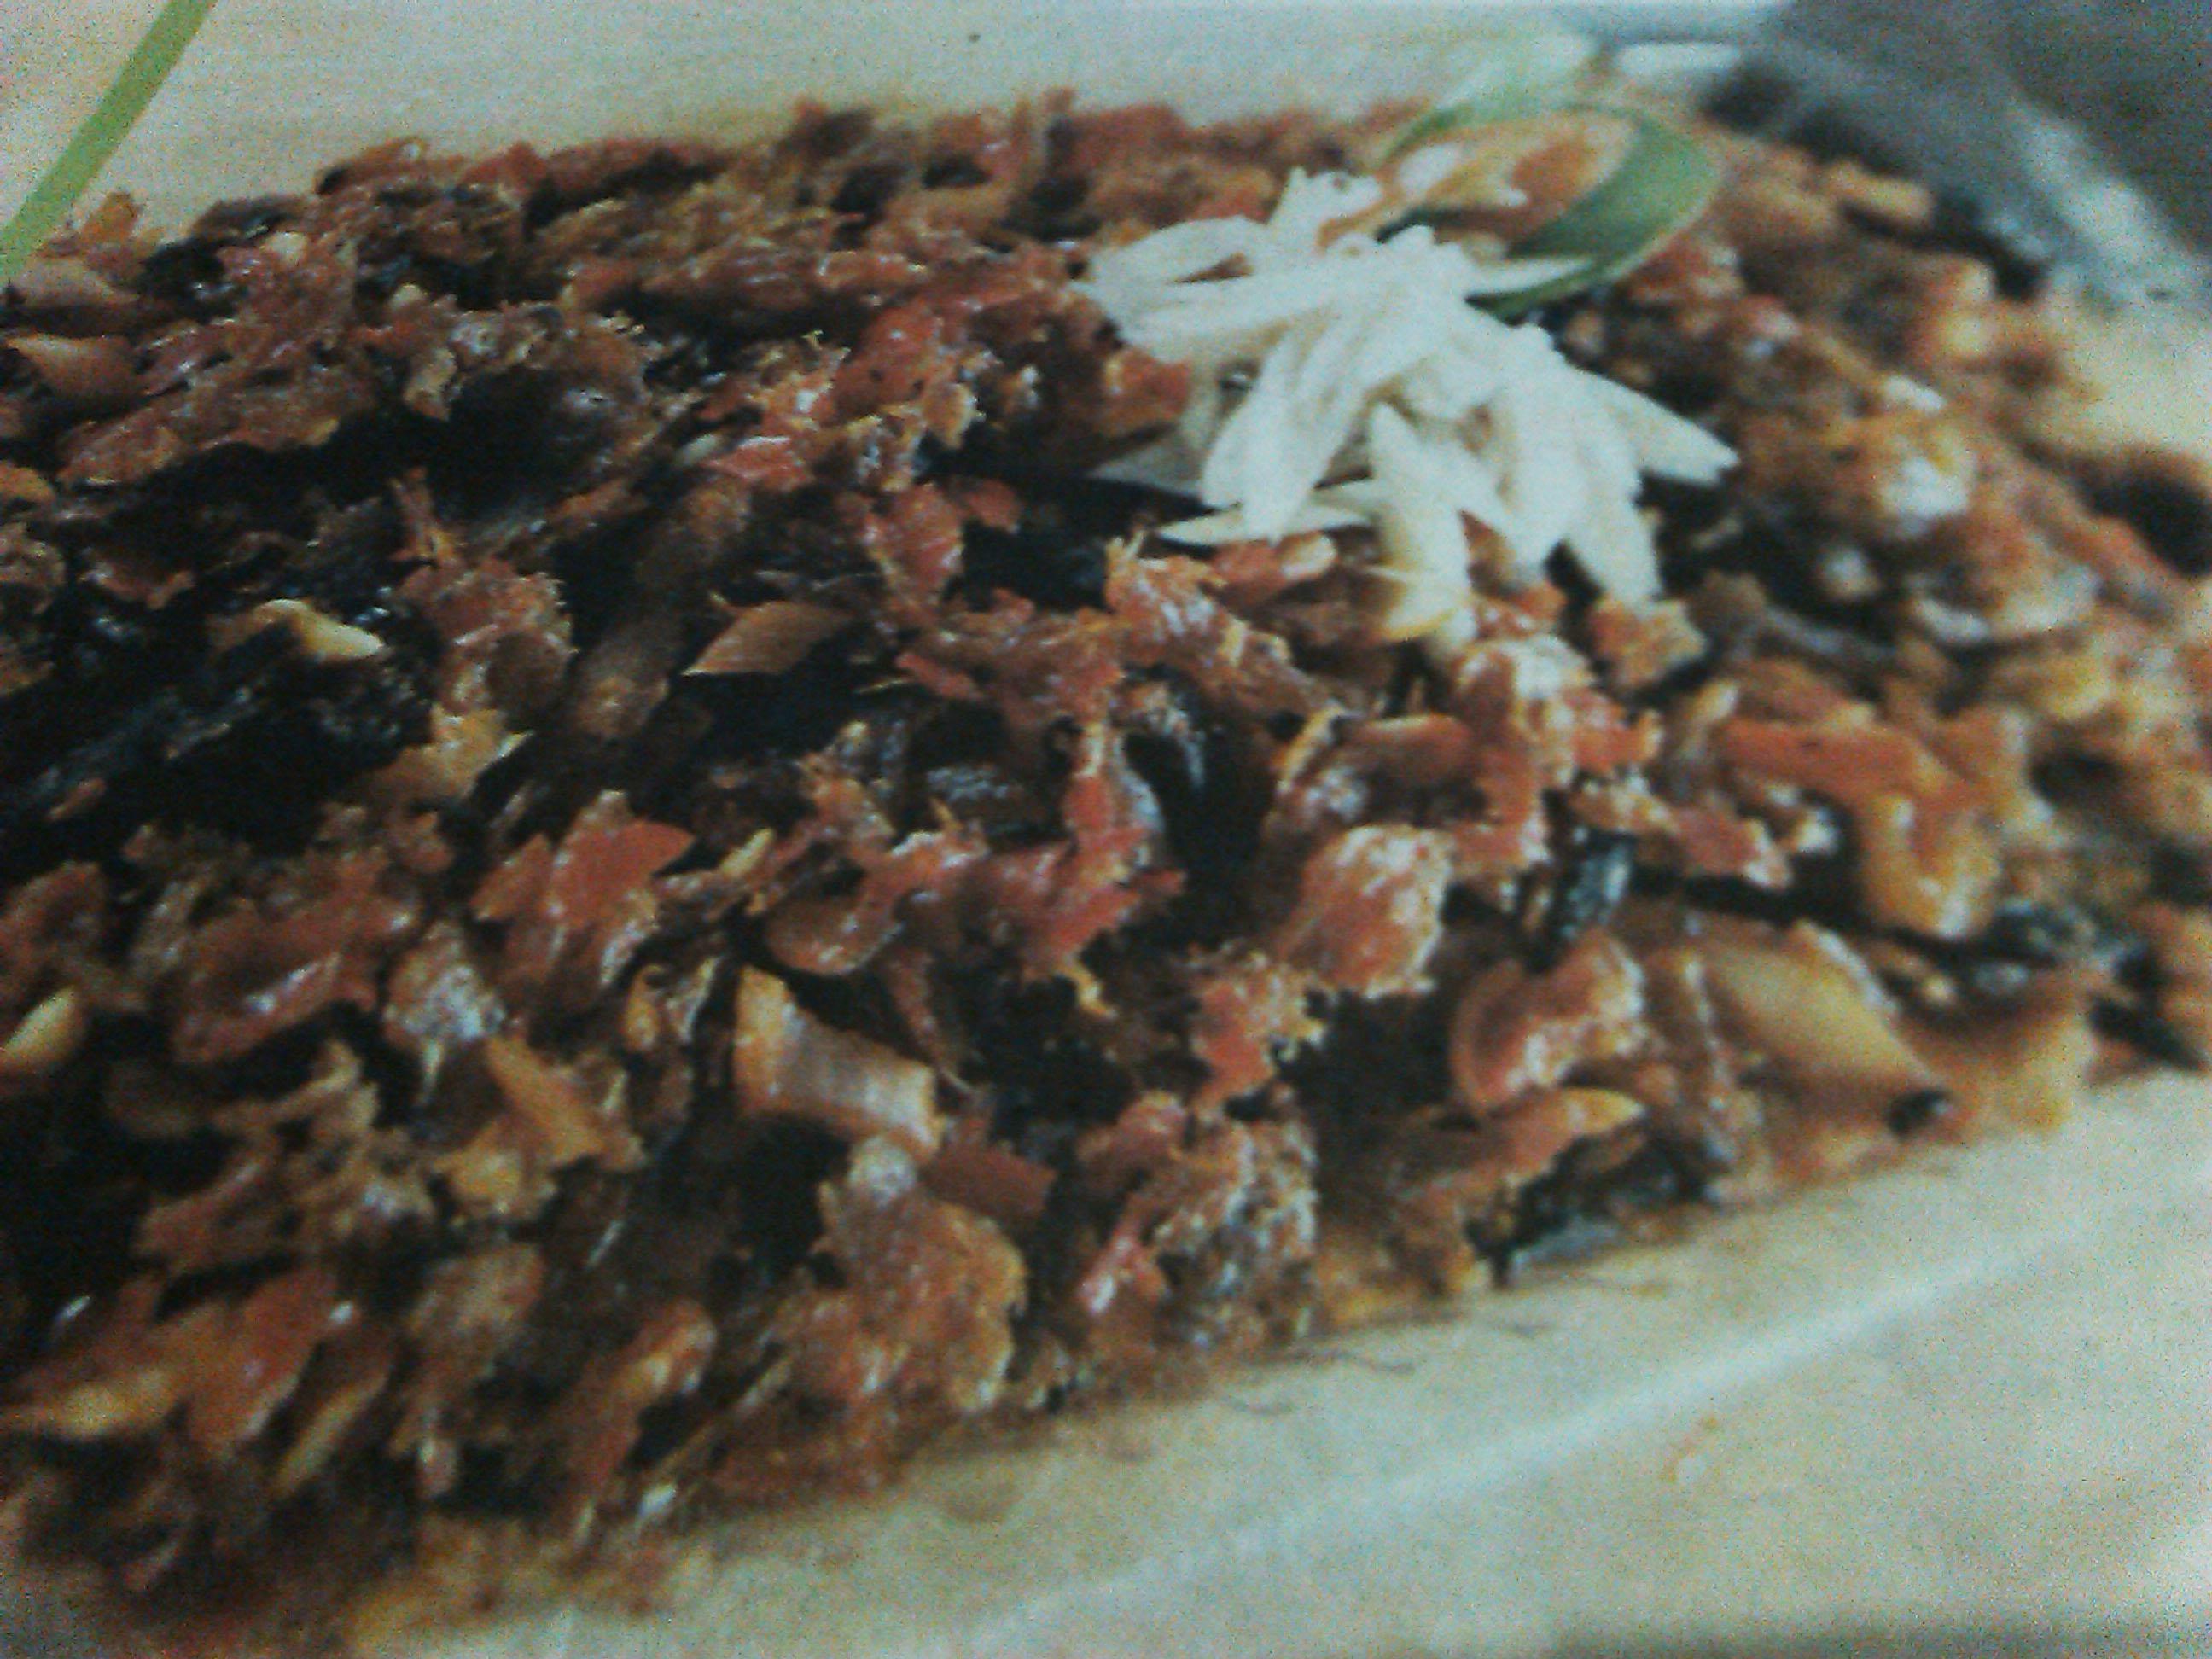 resep-suwir-tonggkol-sambal-sereh